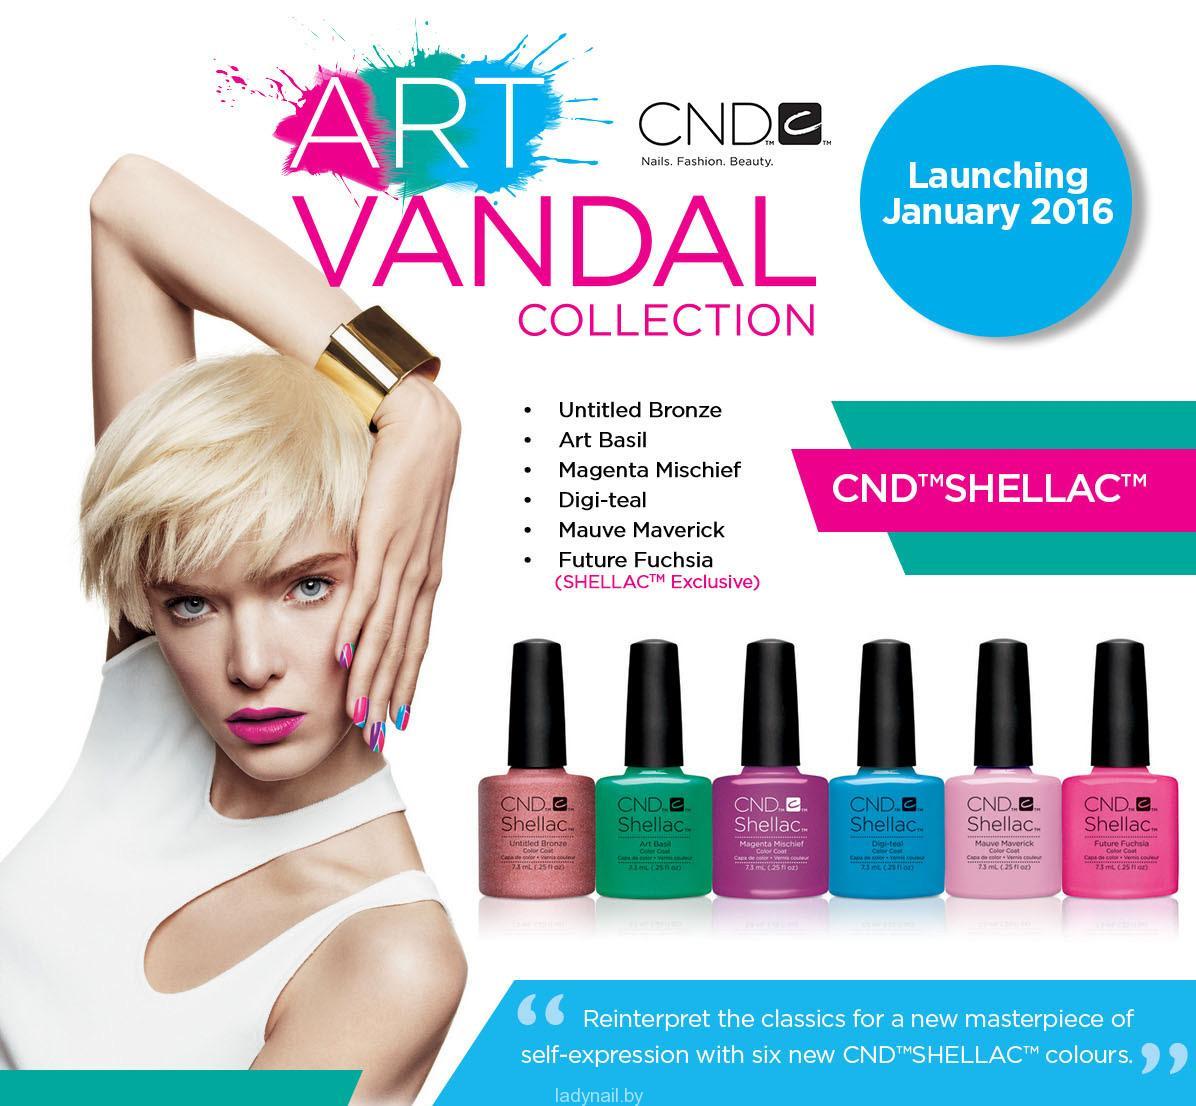 Sellac_Jan_2016_Новая коллекция-гель-лак 2016 CND ART VANDAL COLLECTION